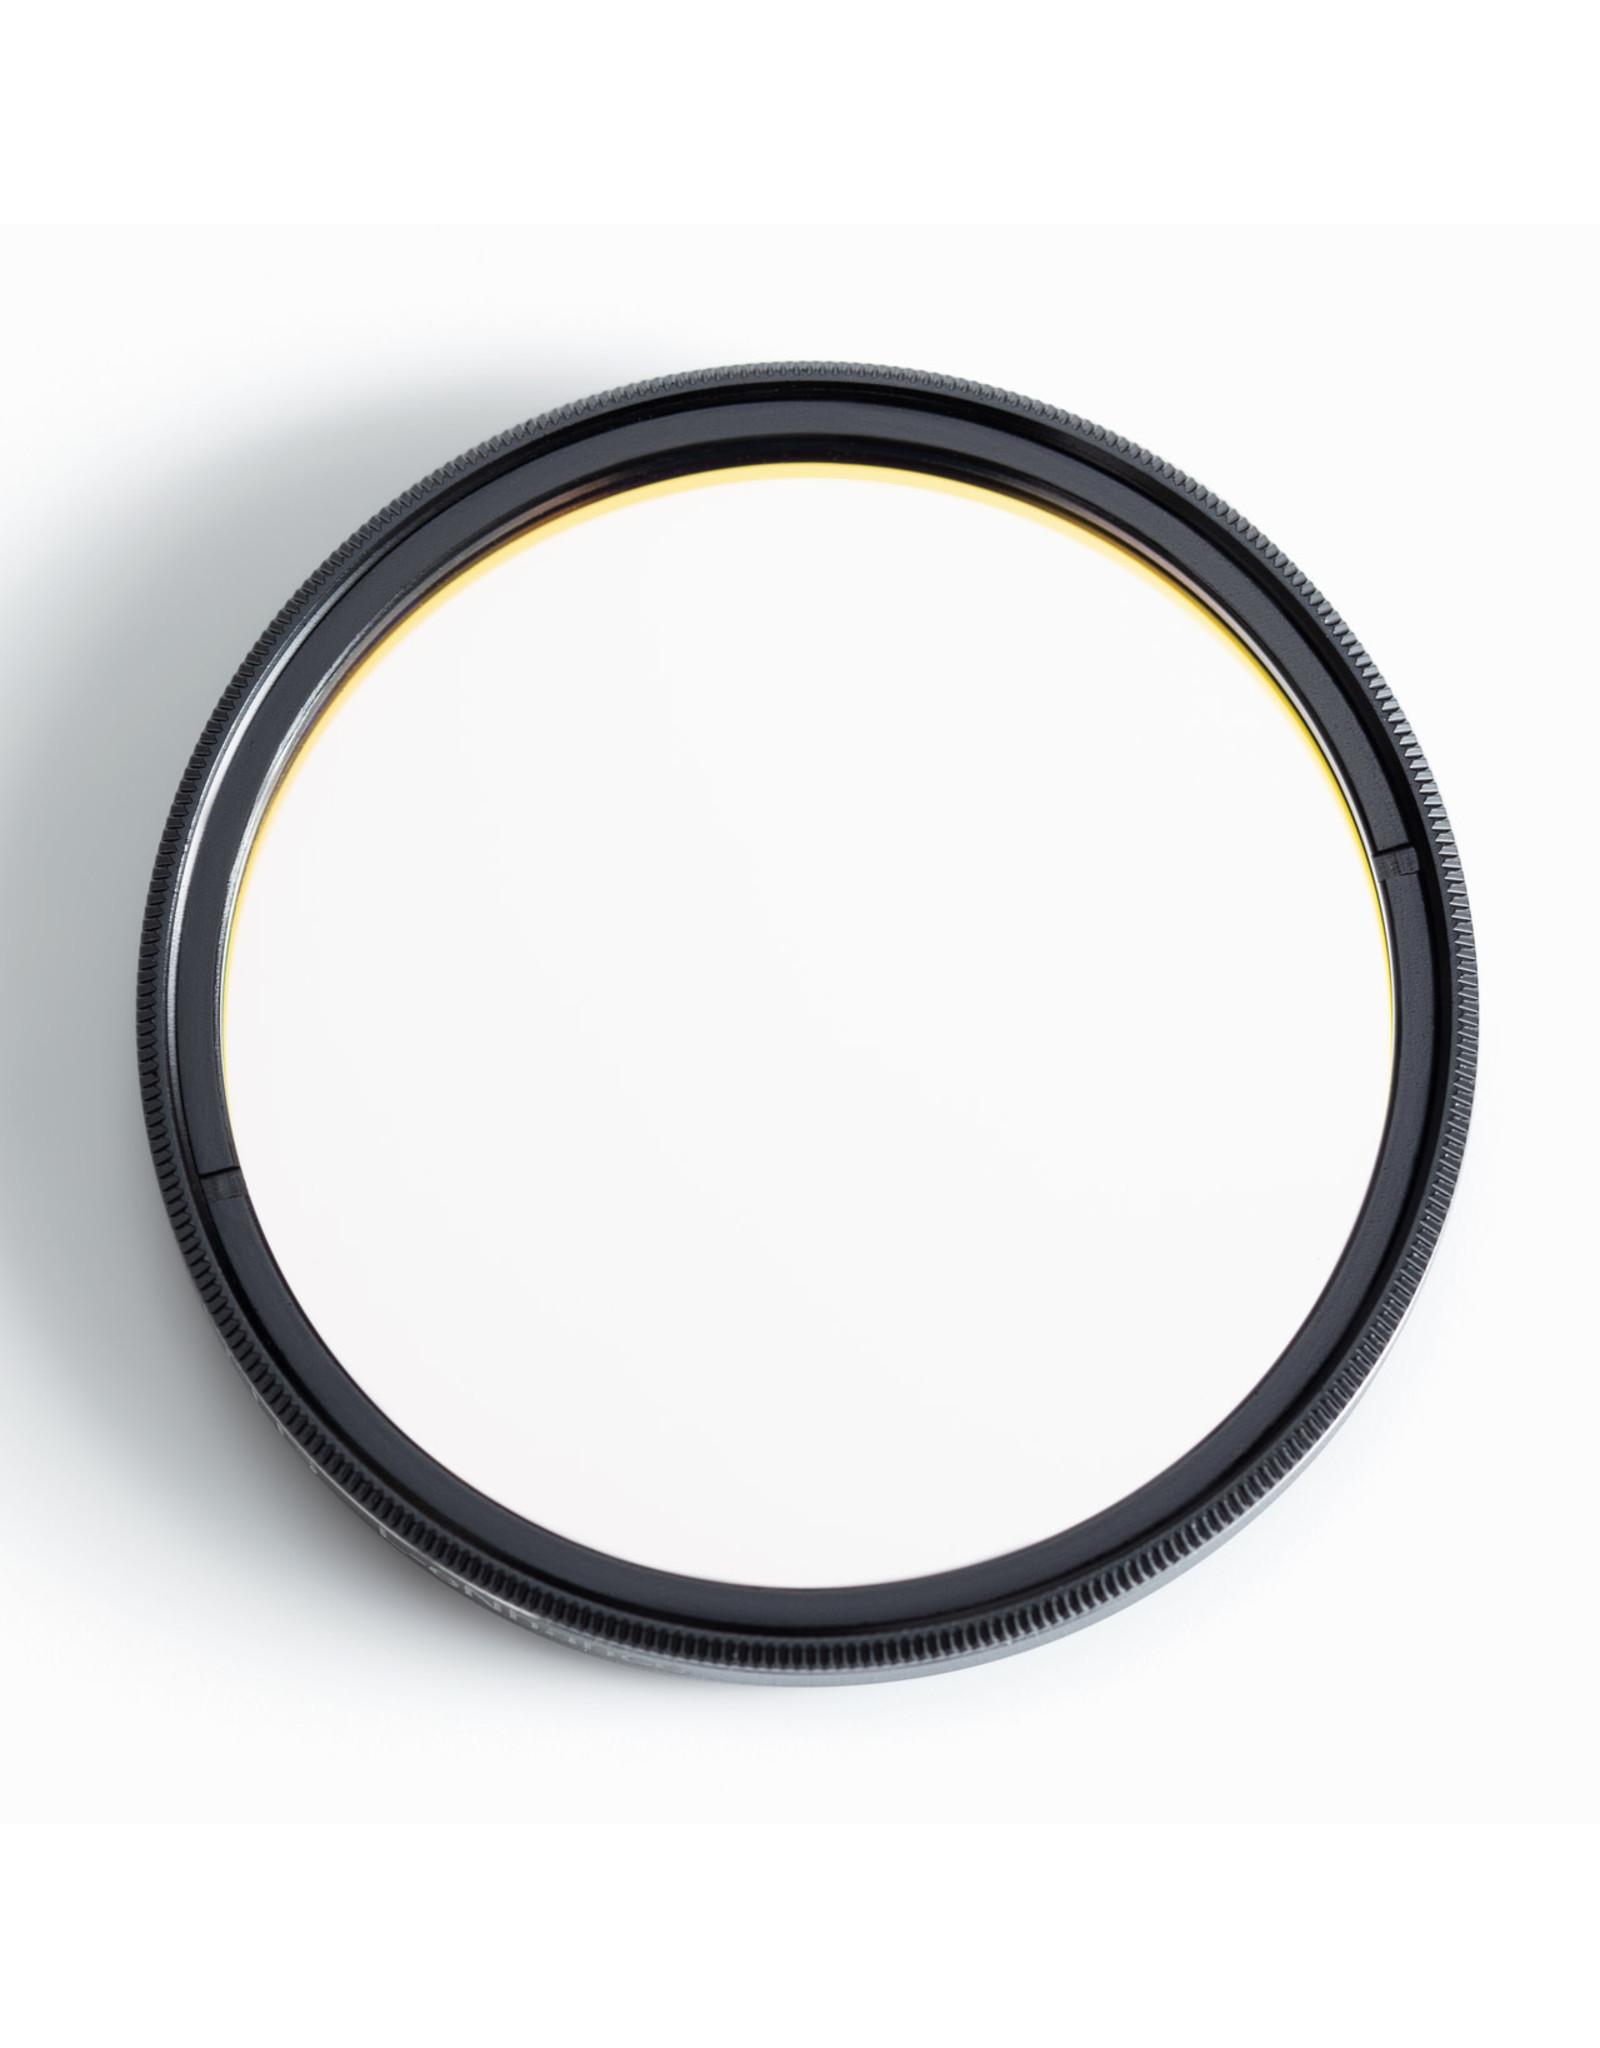 "Optolong Optolong L-eNhance Light Pollution Dual Band Pass Imaging Filter - 2"" Mounted"